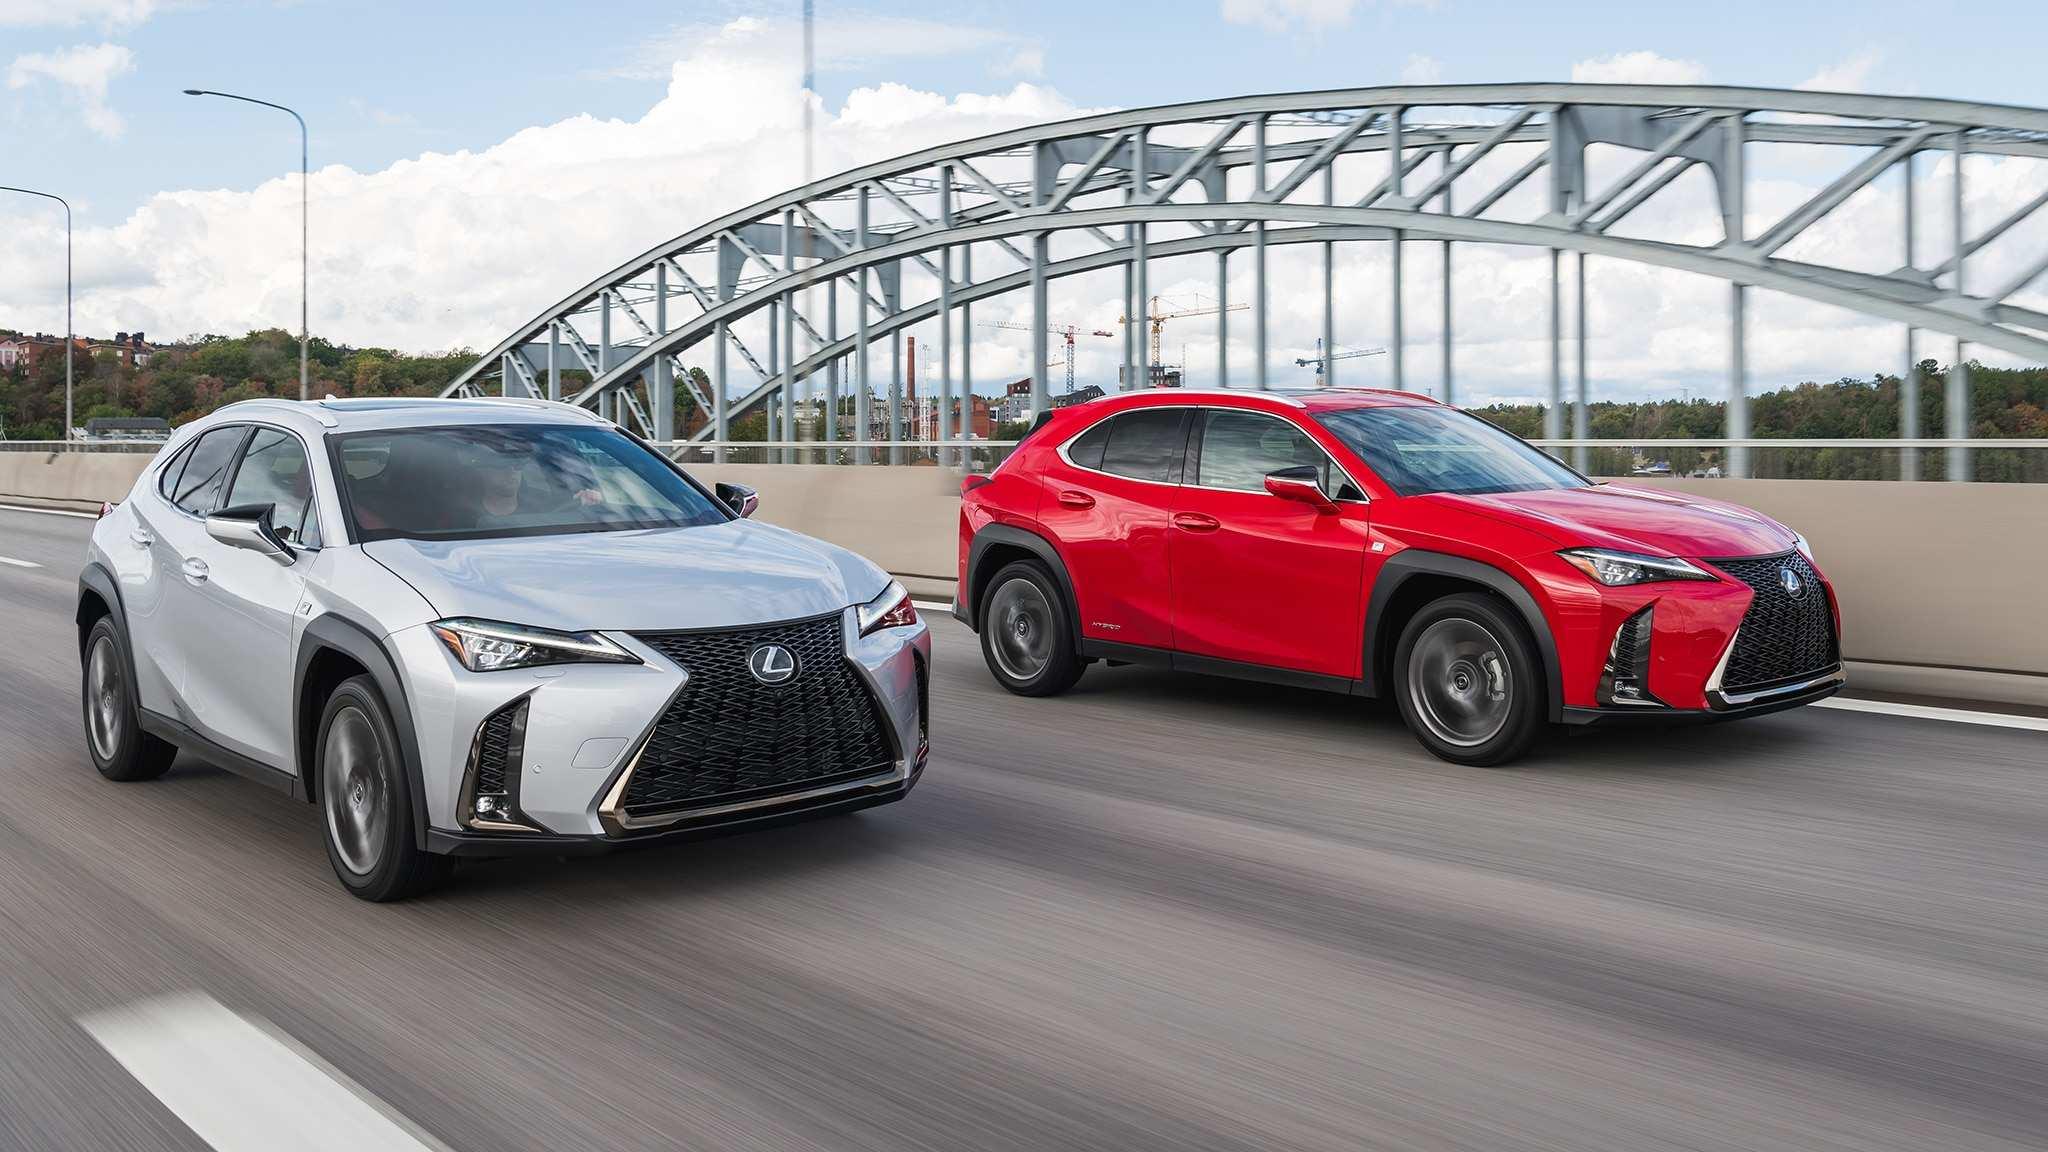 75-New-Lexus-Ux-2020-Dimensions-Review-with-Lexus-Ux-2020-Dimensions